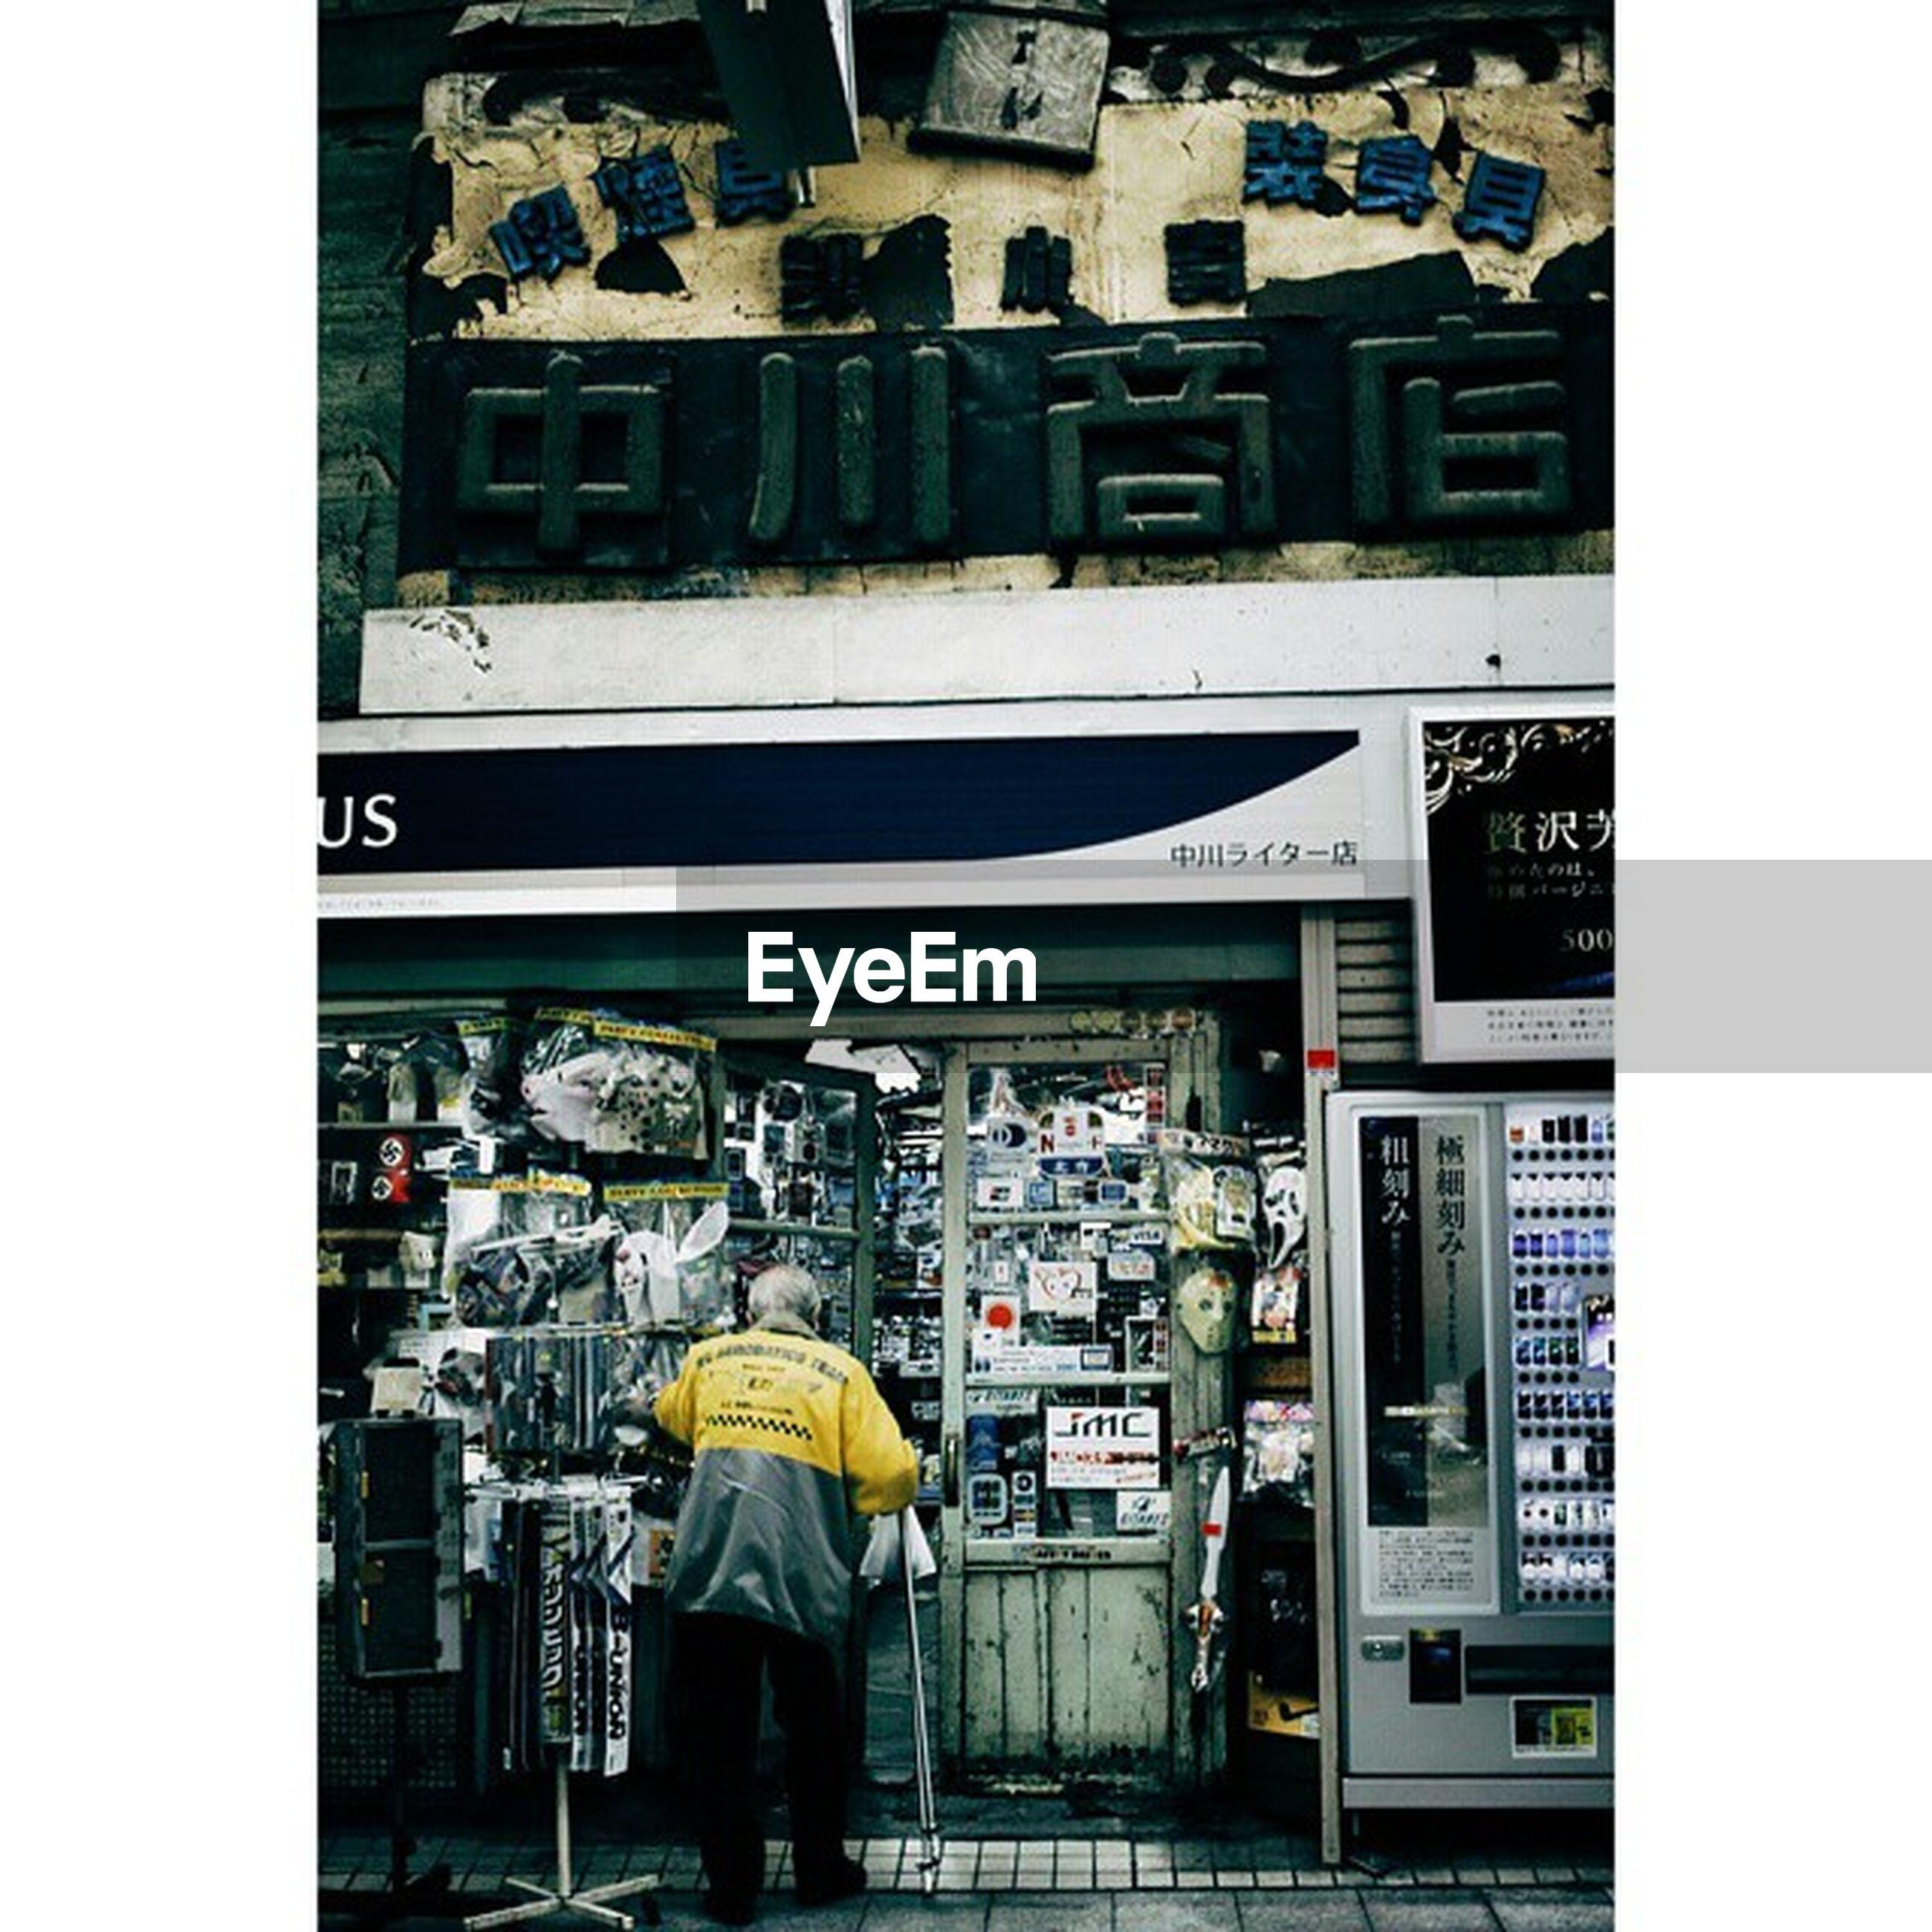 transfer print, auto post production filter, building exterior, architecture, built structure, city, store, men, retail, market, city life, street, shop, for sale, shopping, variation, abundance, window, display